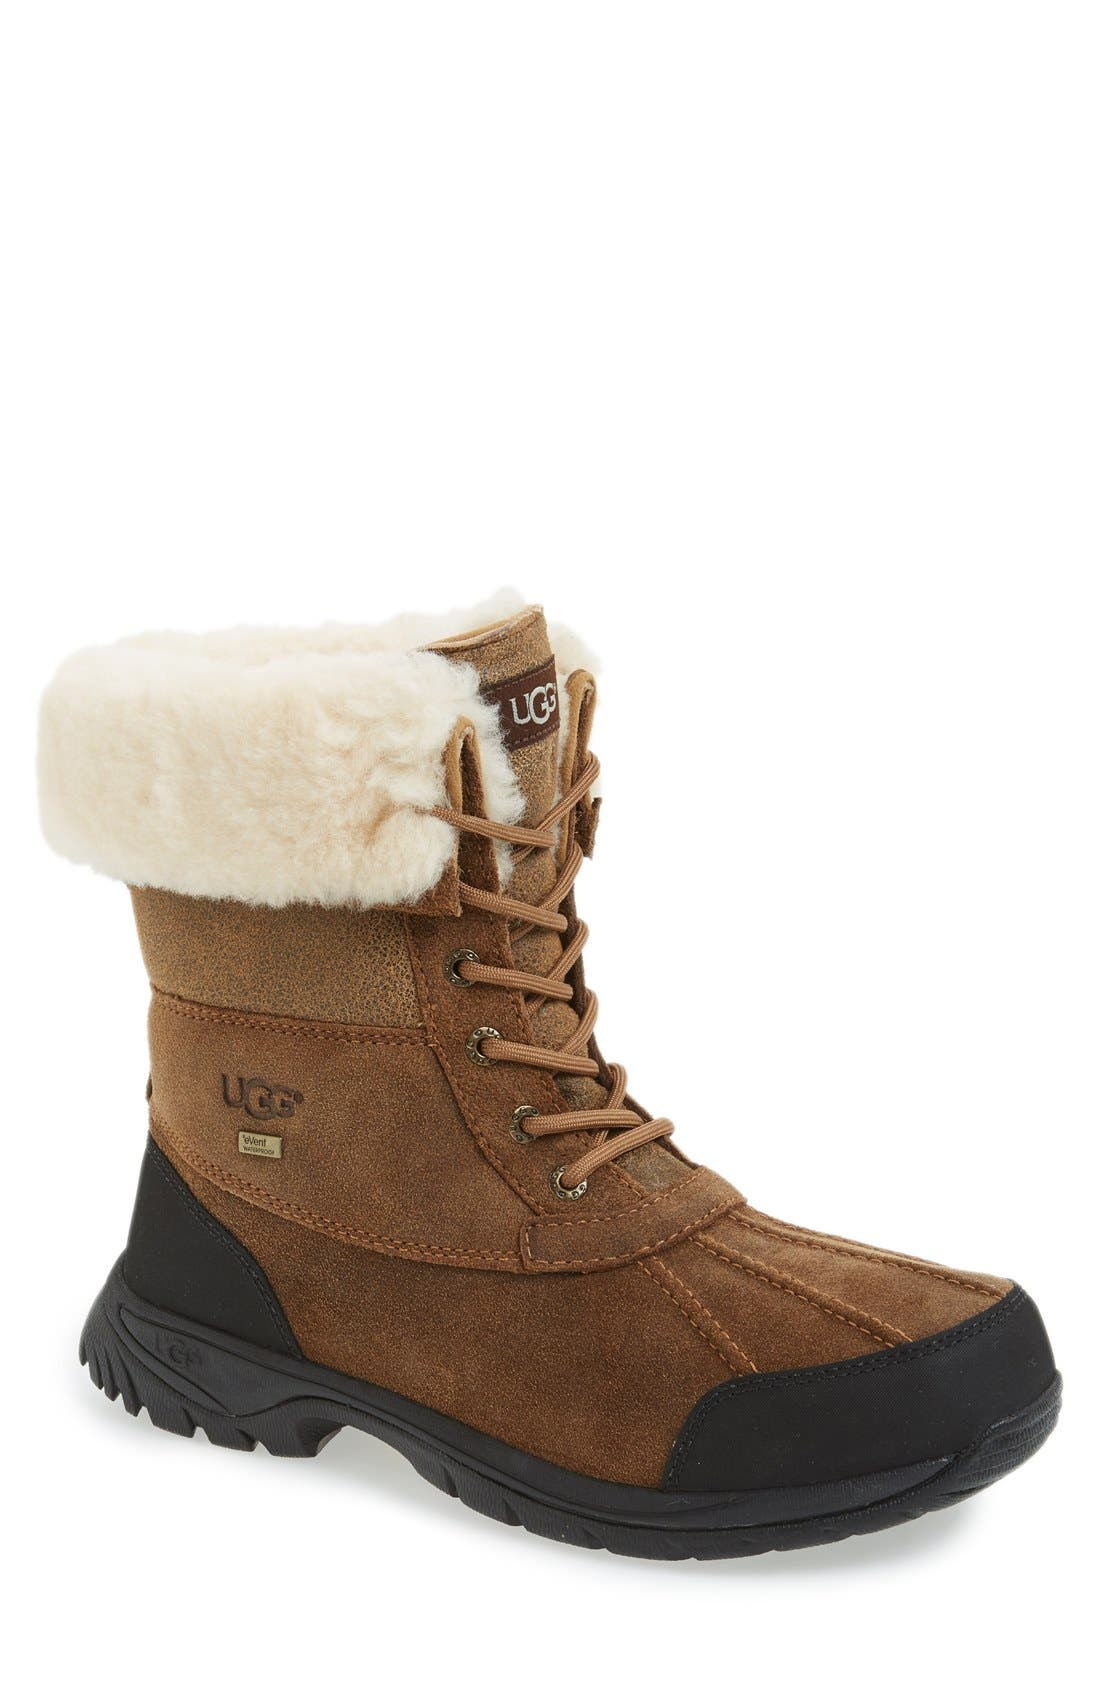 Alternate Image 1 Selected - UGG® Butte Bomber Snow Boot (Men)